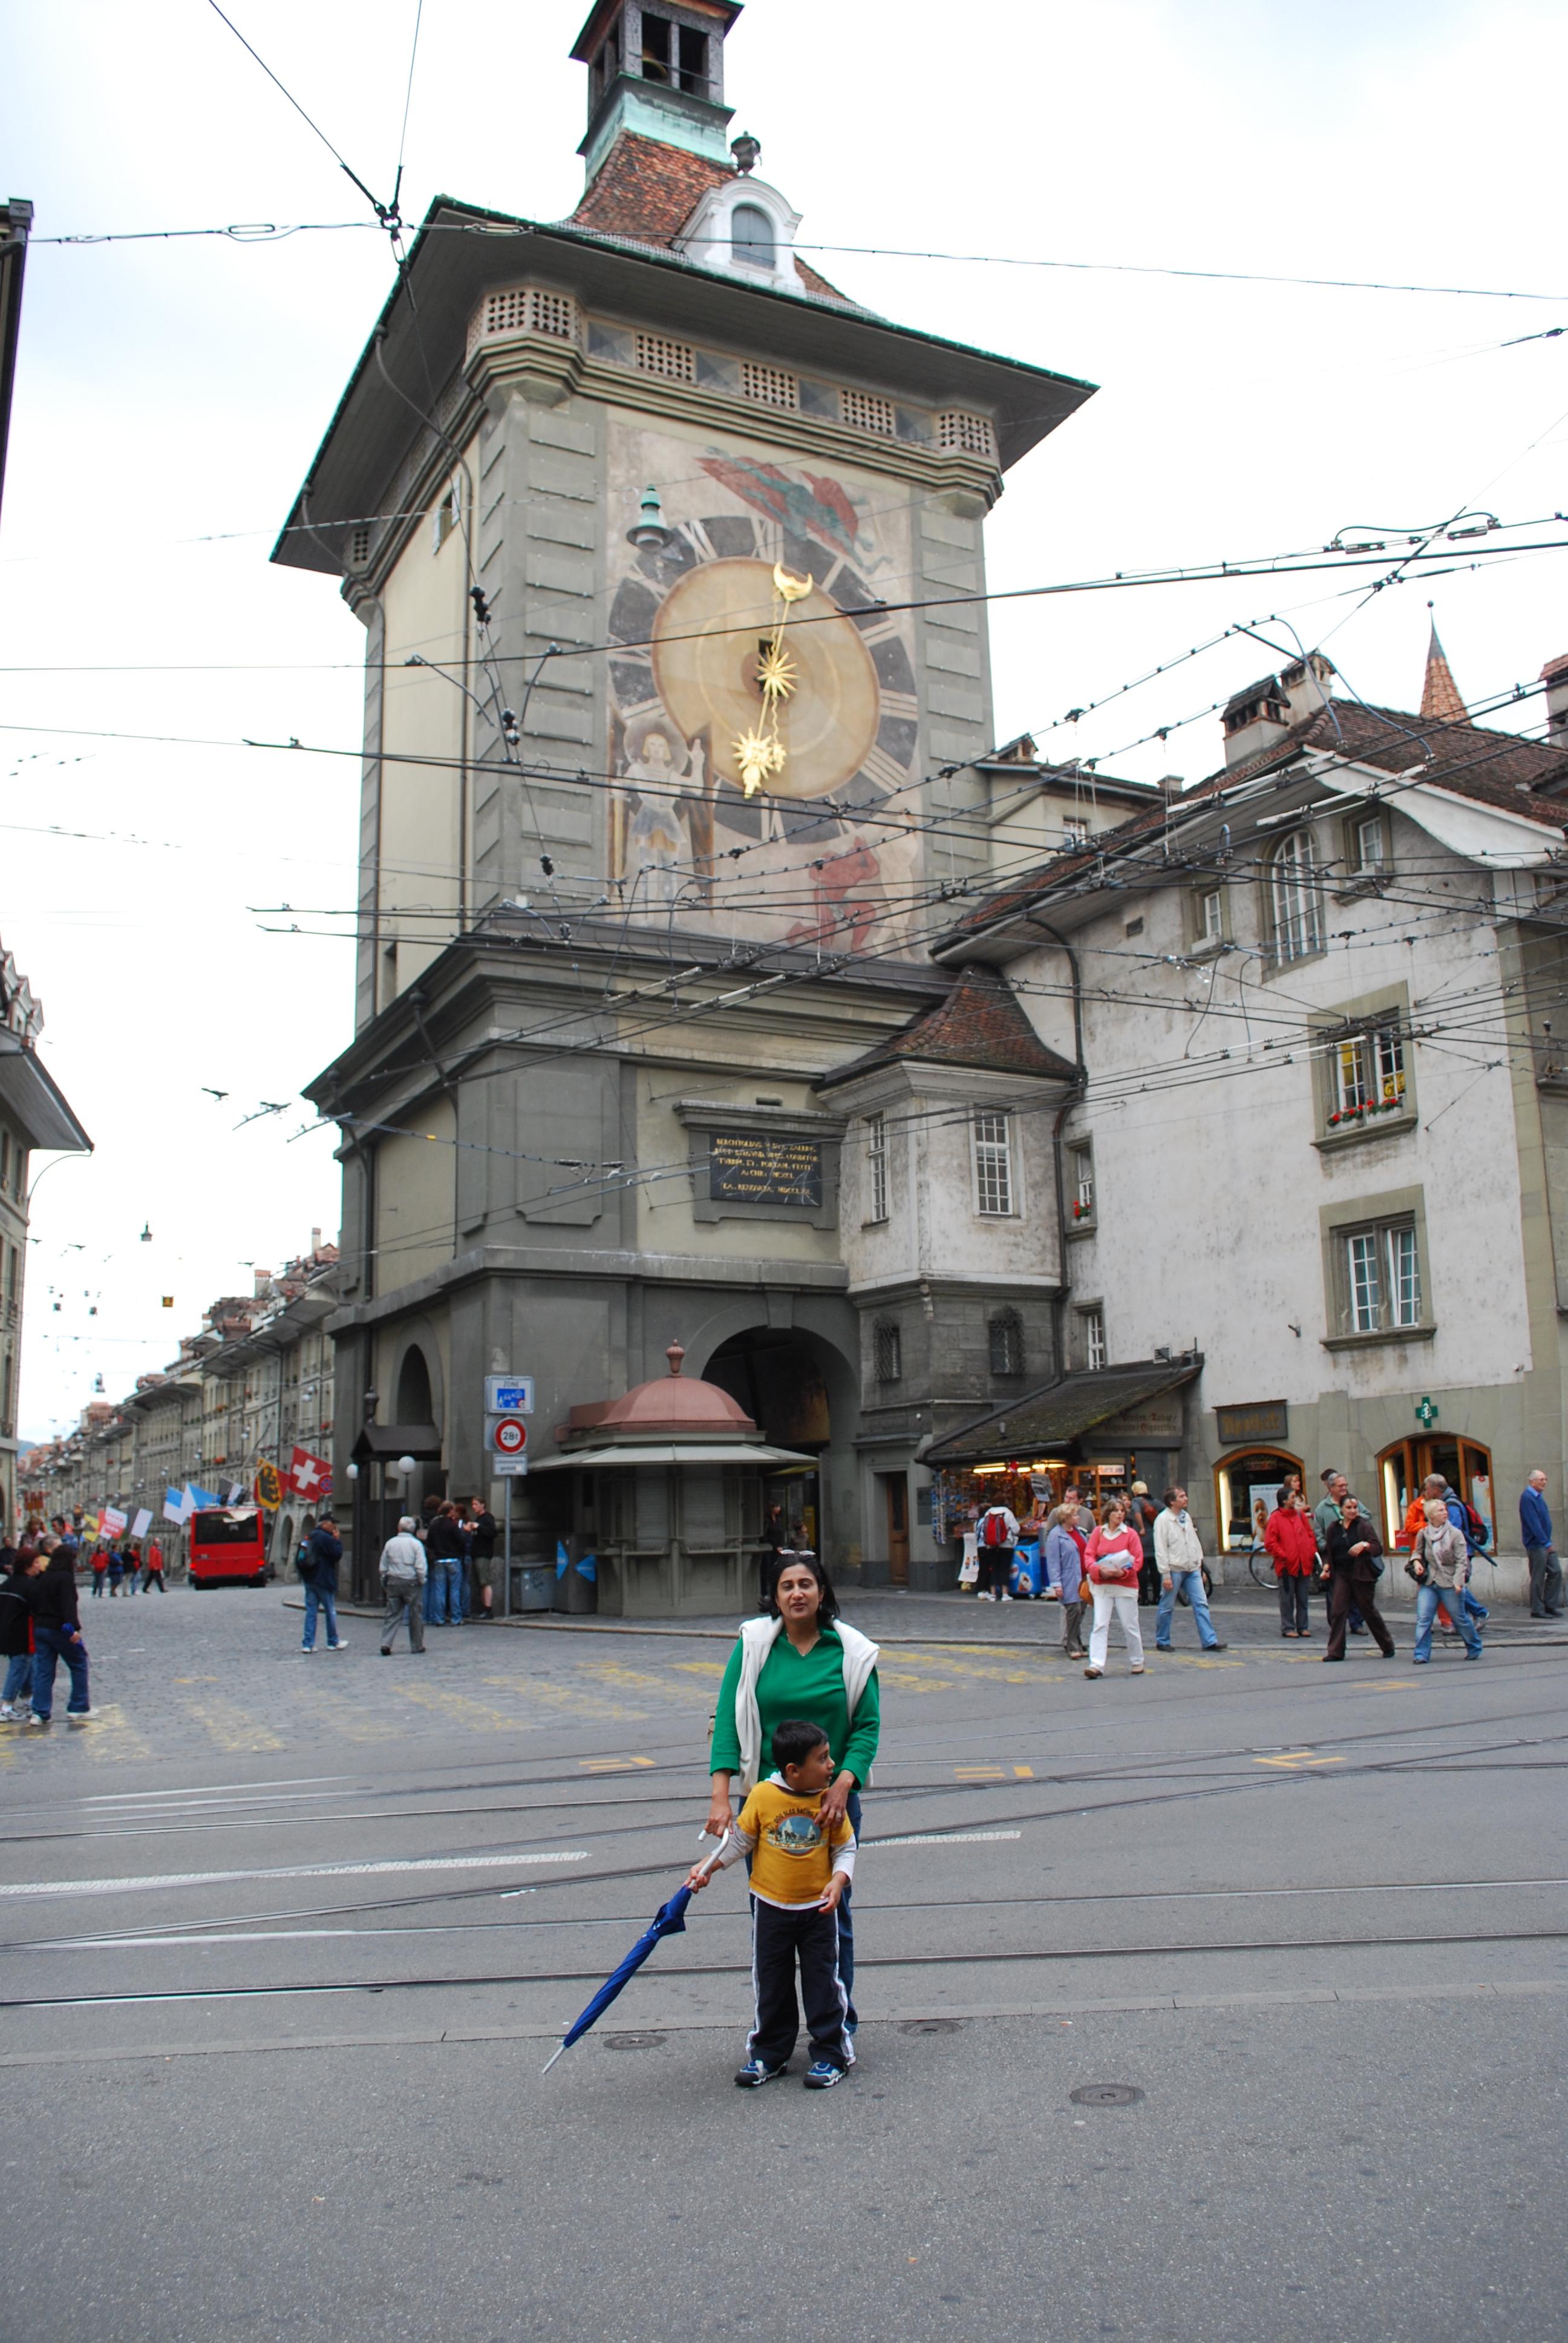 The Bern Clock Tower